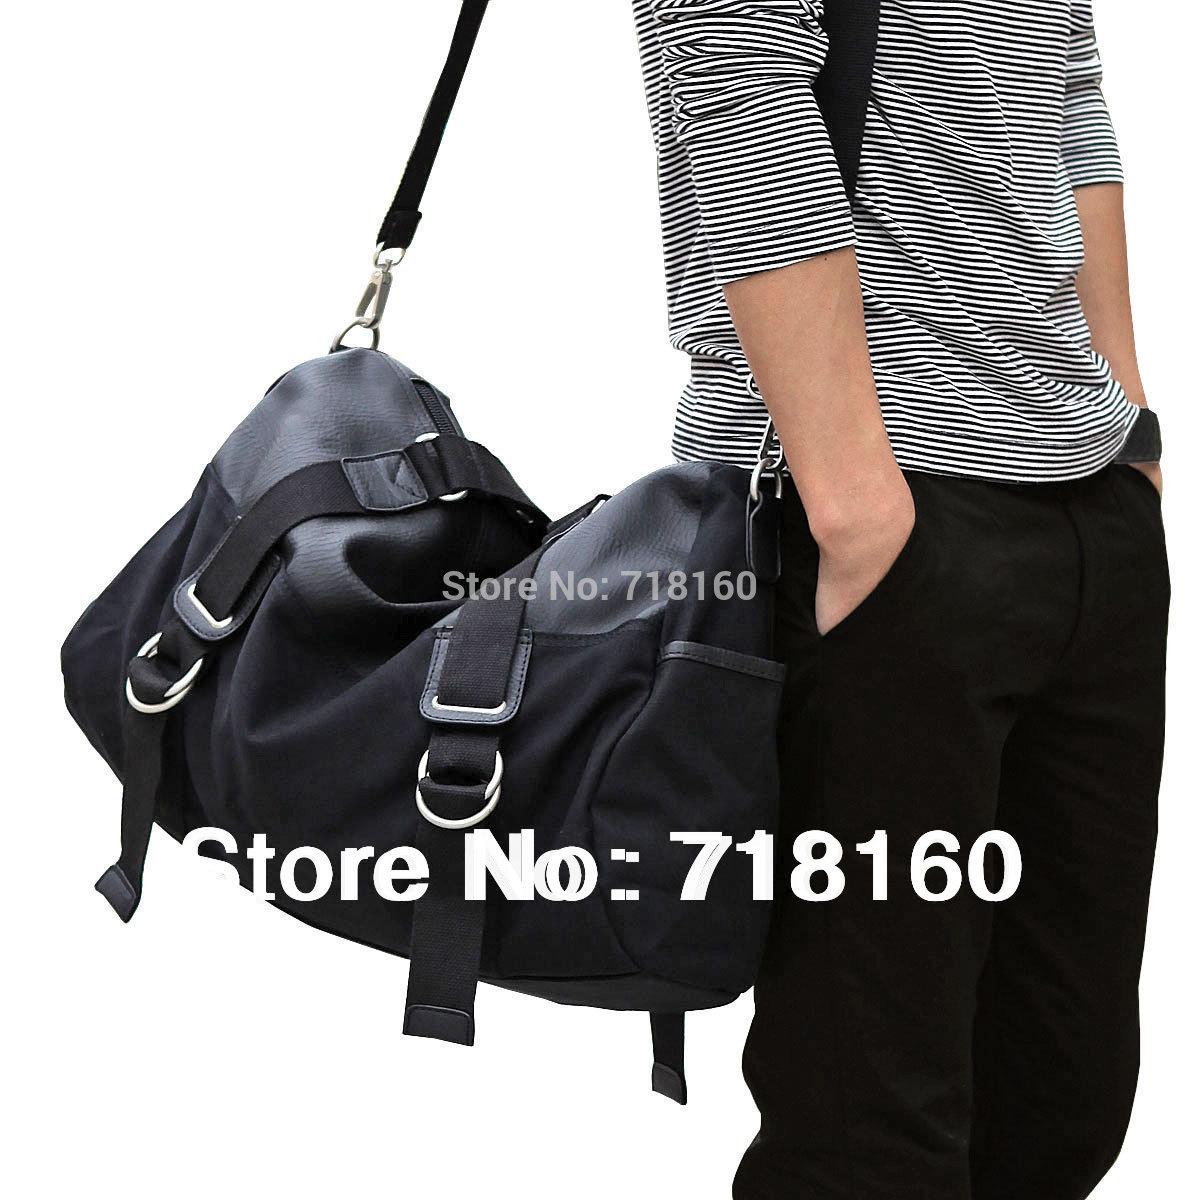 2014 New Fashion canvas men's travel bag messenger bags waterproof black color shoulder bag sports gym tote free shipping(China (Mainland))